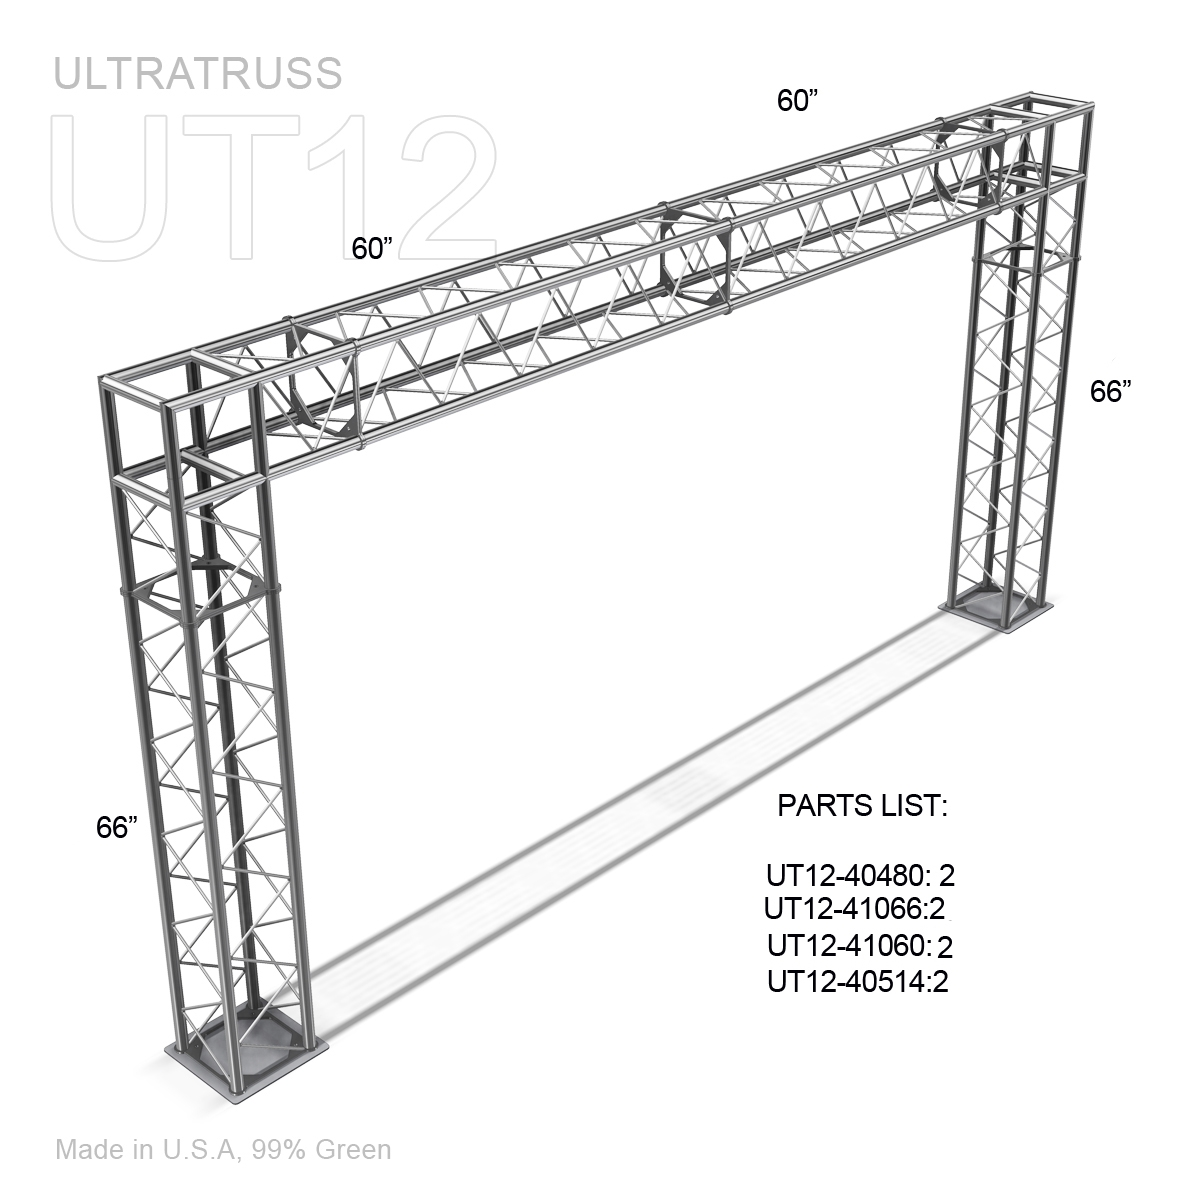 Q013015 01 02 4 ultratruss 12inch box truss arch, 14' wide x 7' tall